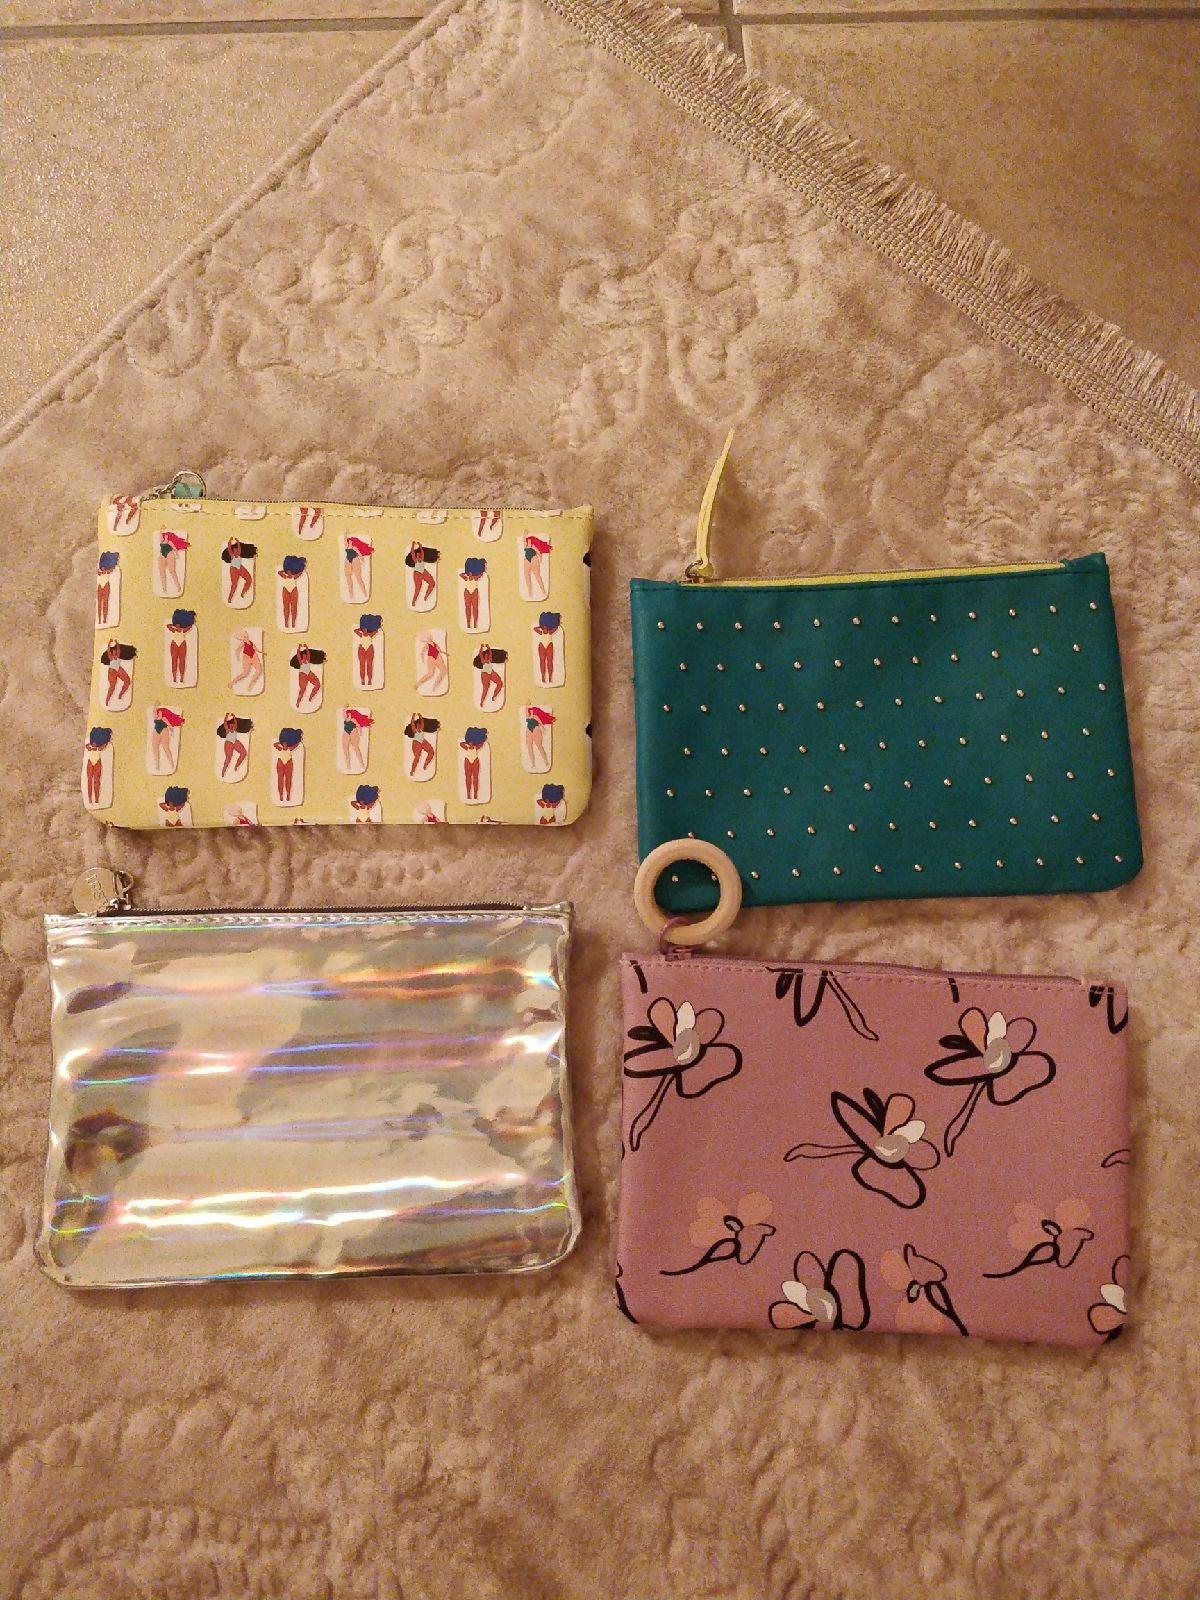 4 beautiful ipsy makeup bags